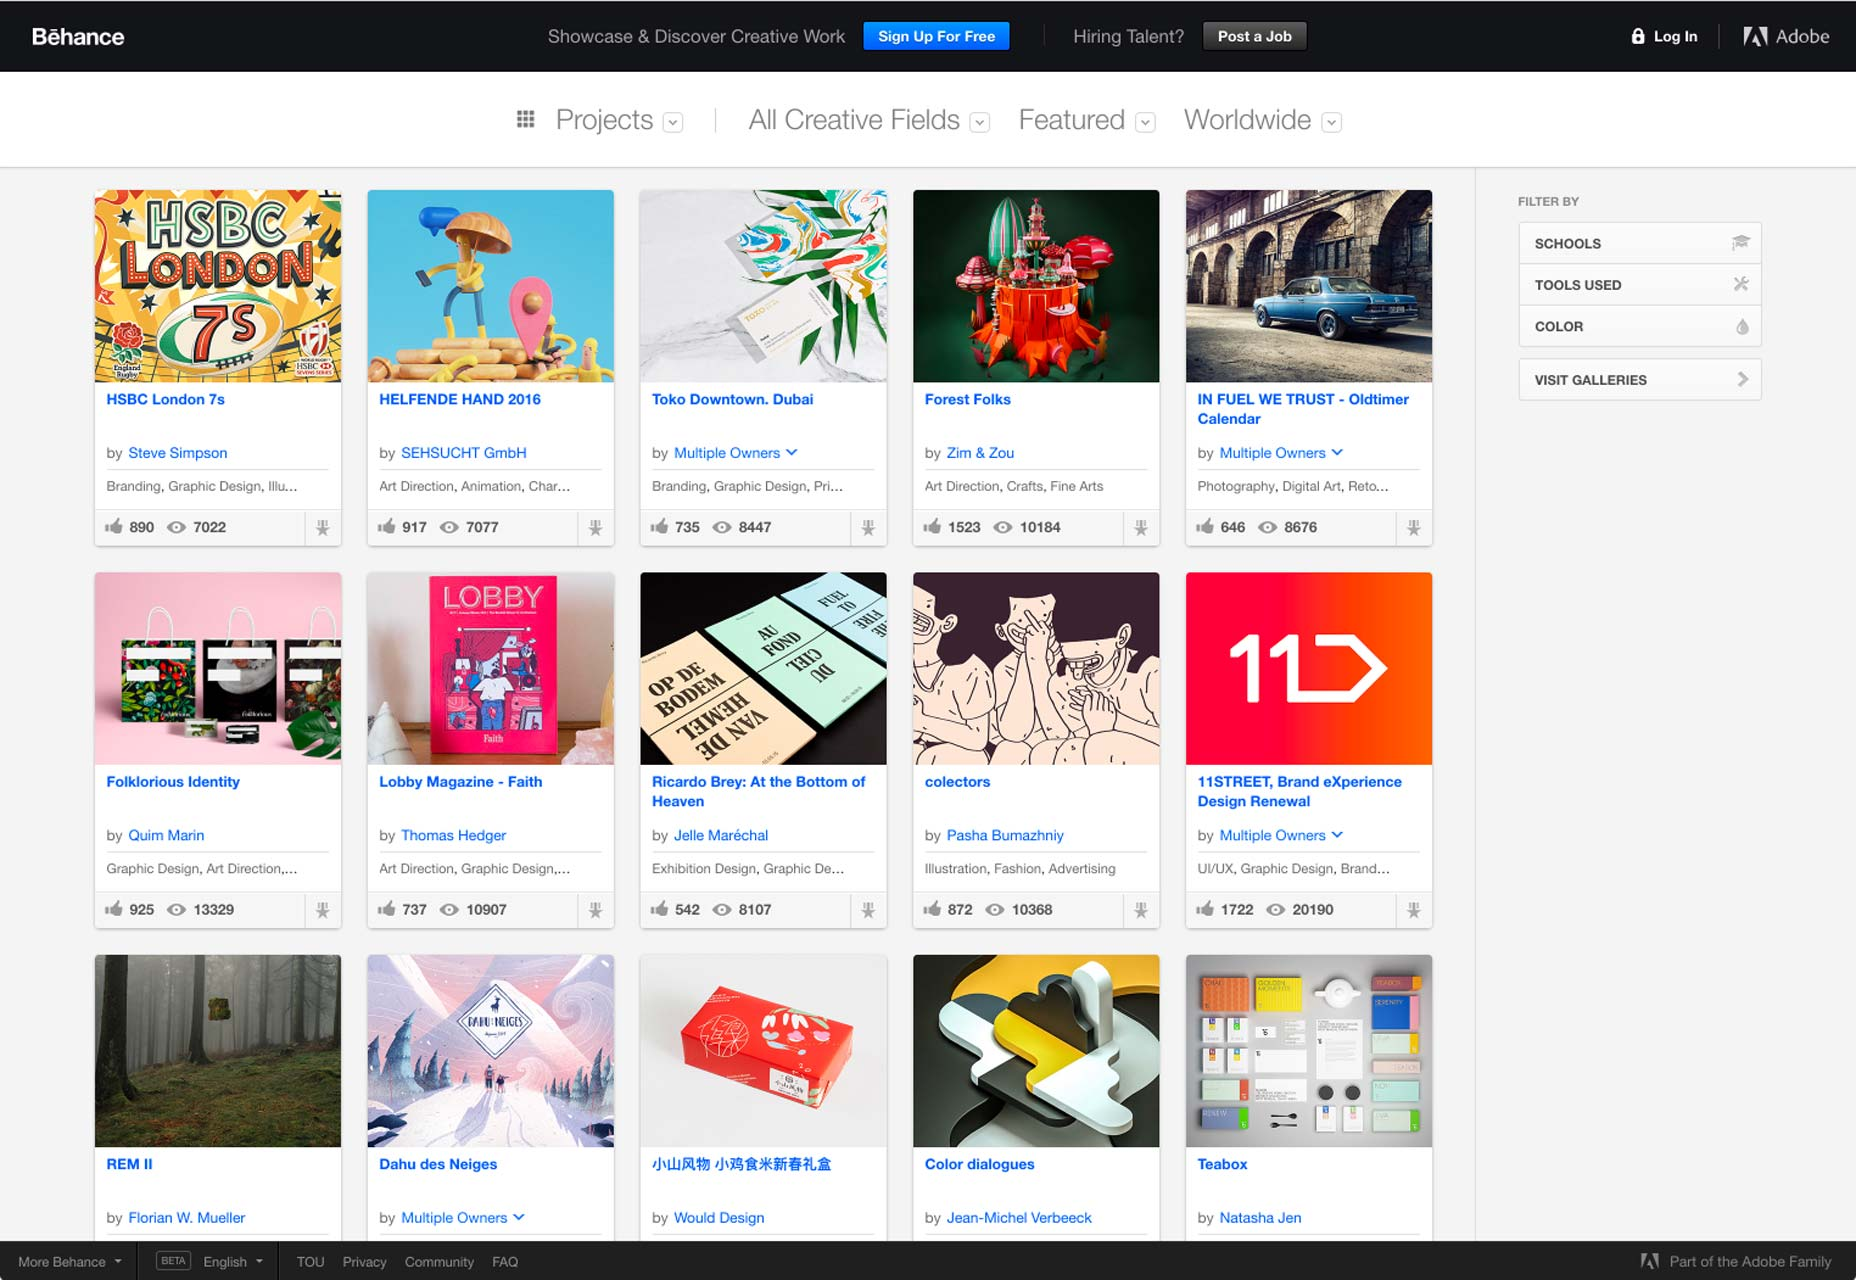 50 creative card UI designs | Webdesigner Depot